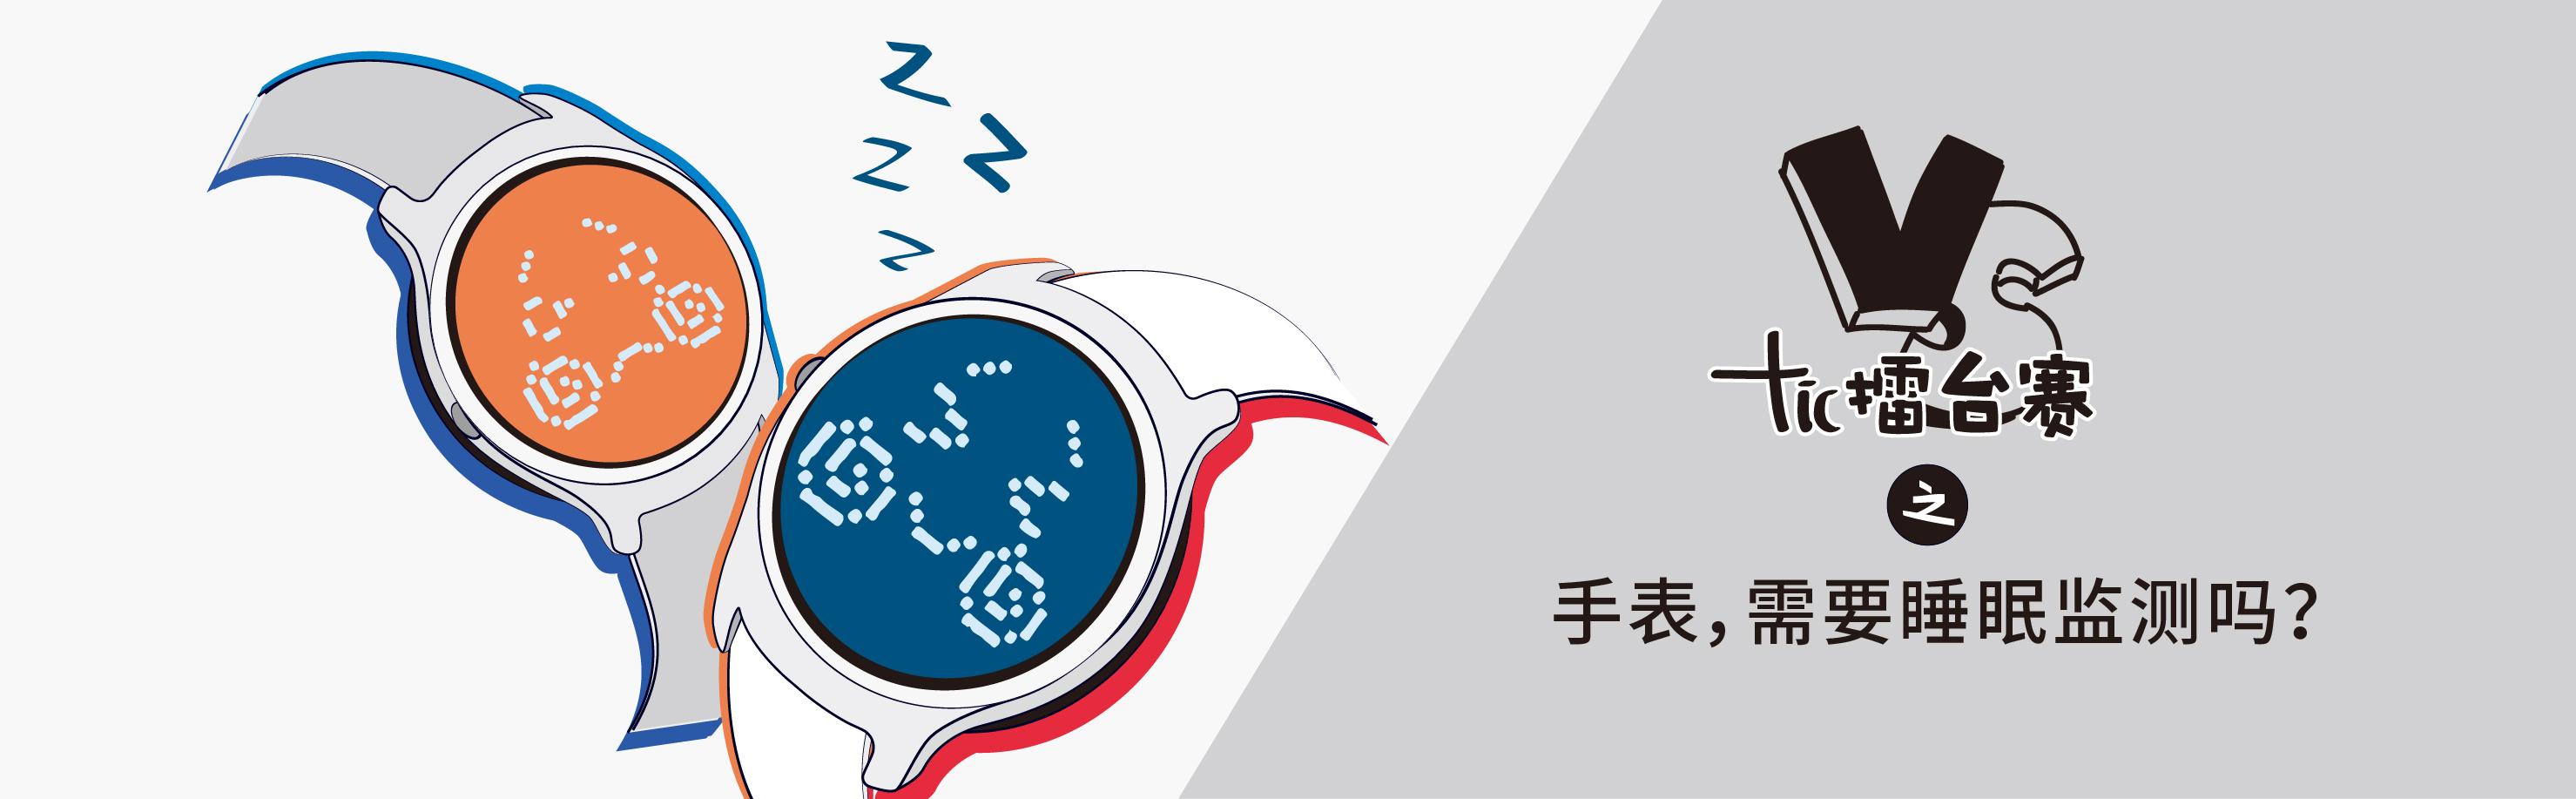 Tic擂台赛Round2——智能手表是否需要睡眠监测